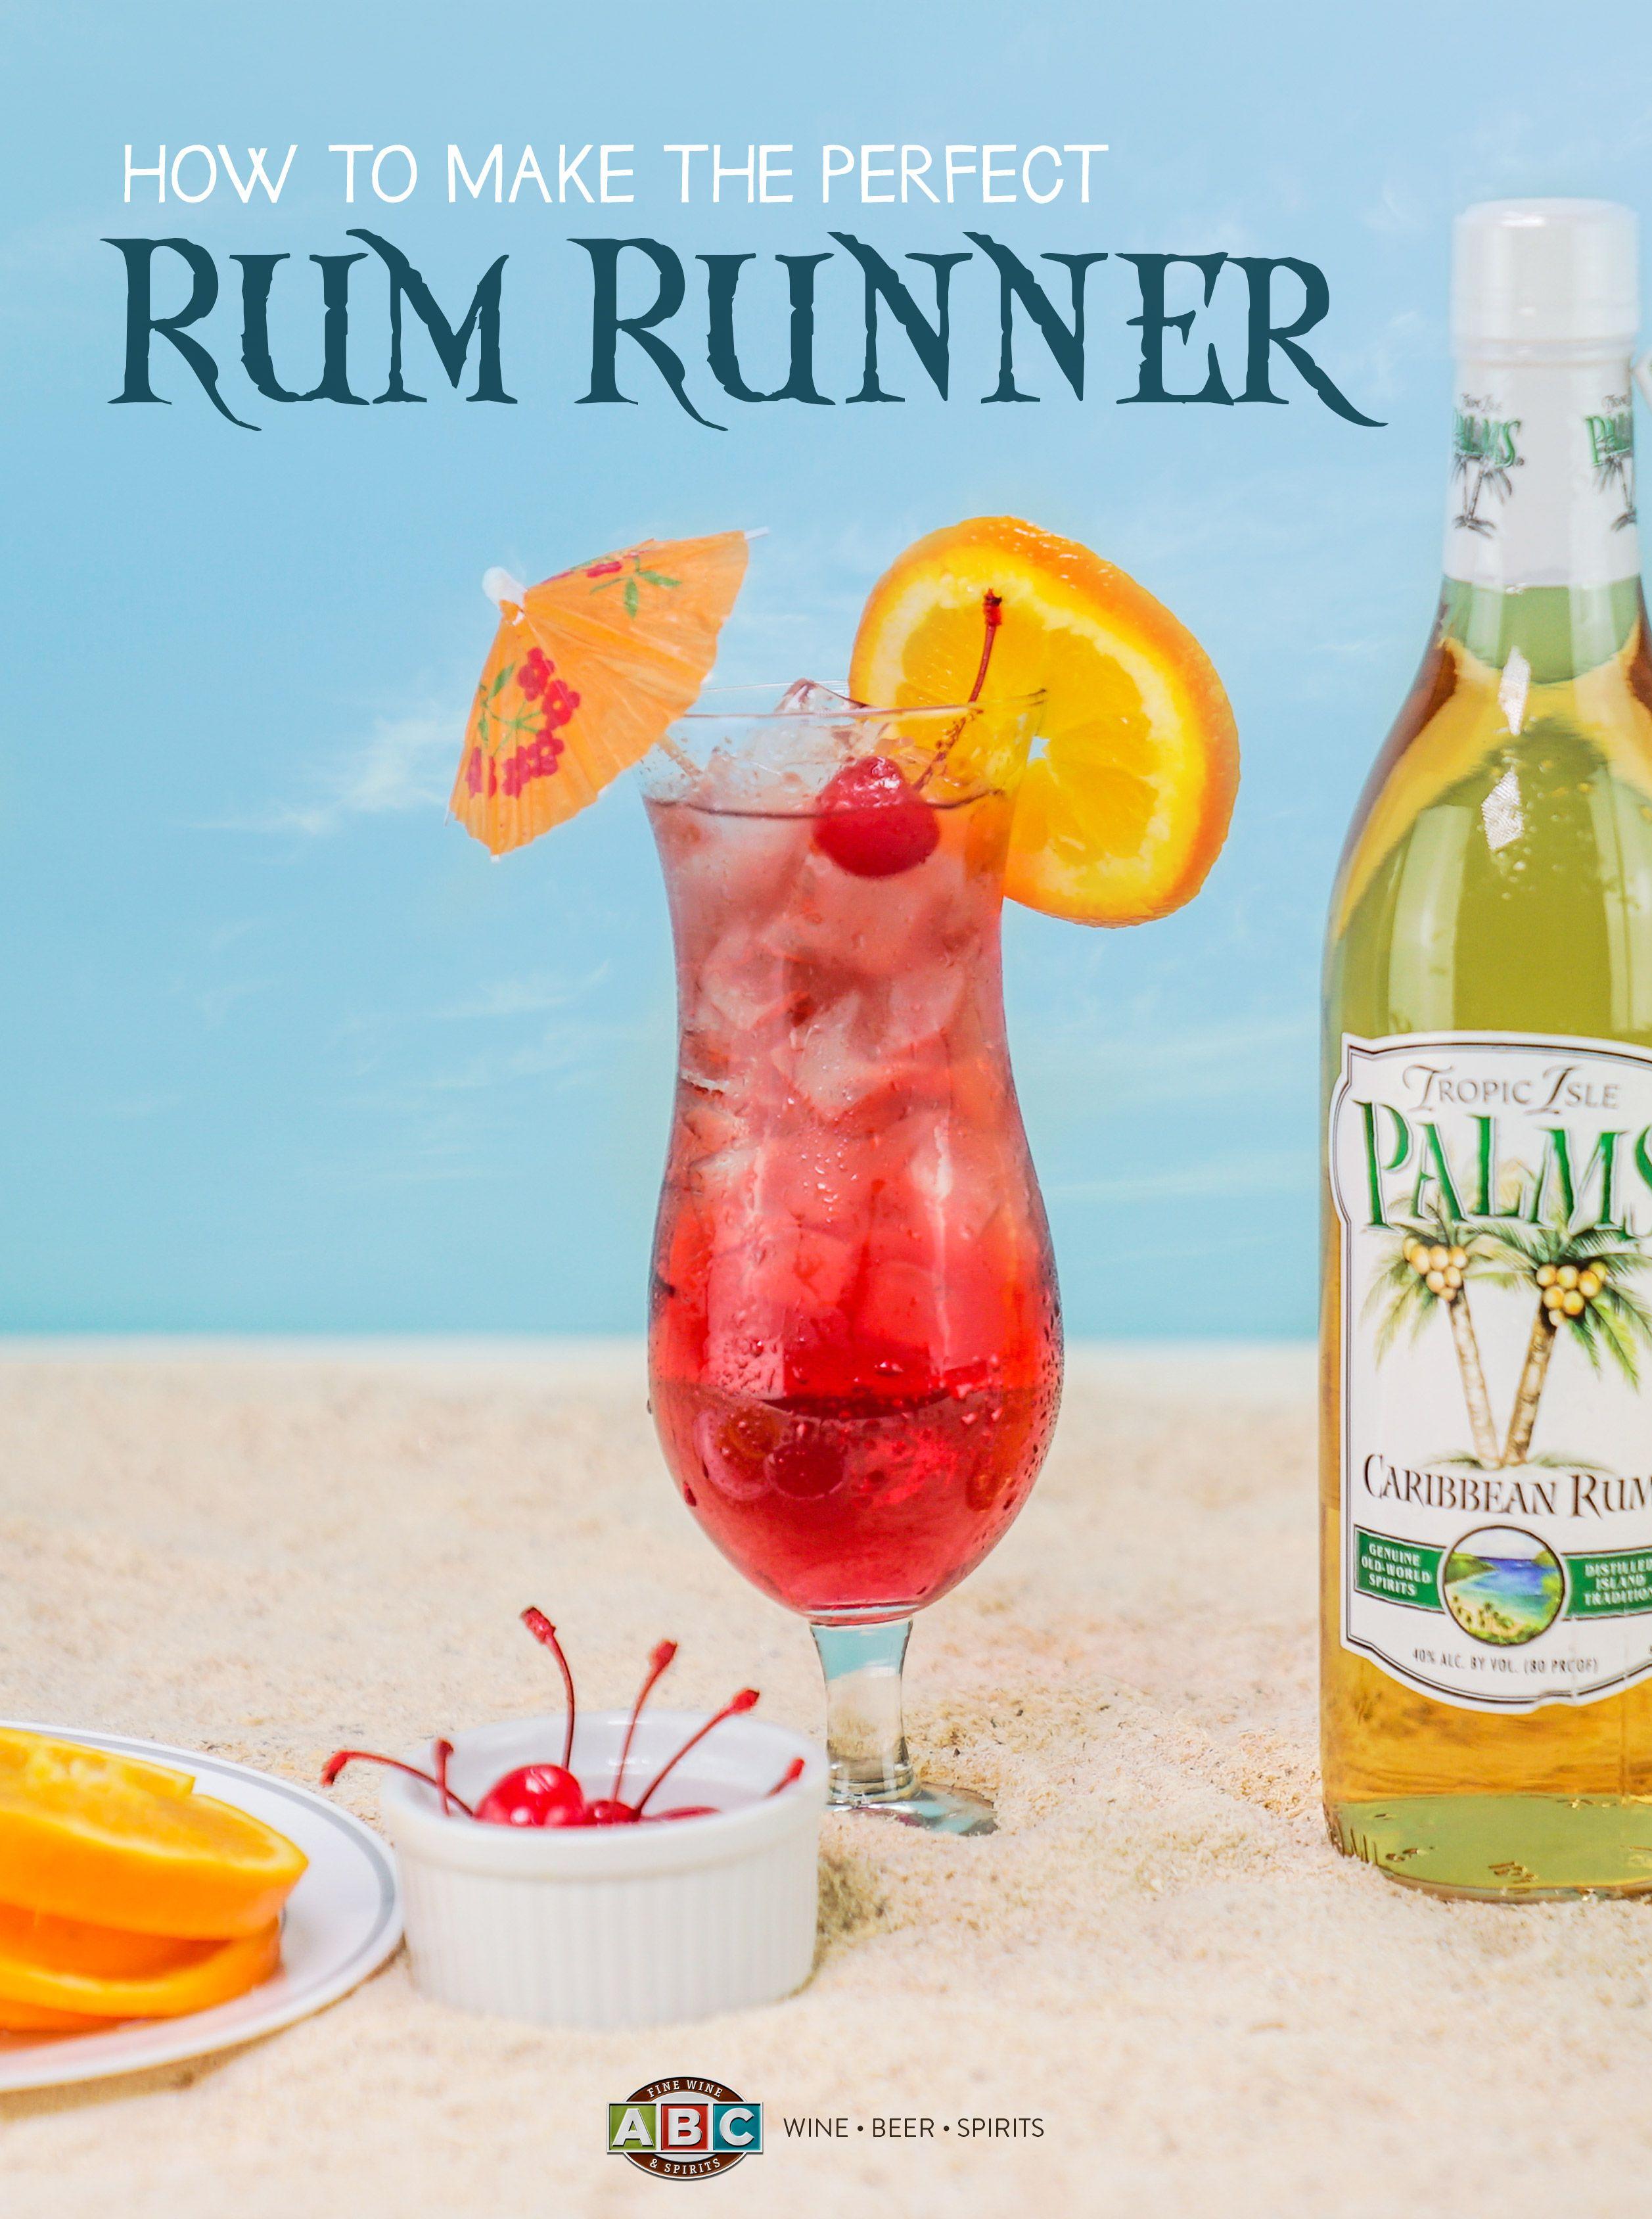 Rum Runner 1 Oz Palms White Rum 1 Oz Palms Gold Rum 1 Oz Banana Liqueur 1 Oz Blackberry Liqueur 1 Oz Orange Juice 1 Oz Pine Fun Drinks Rum Gold Rum